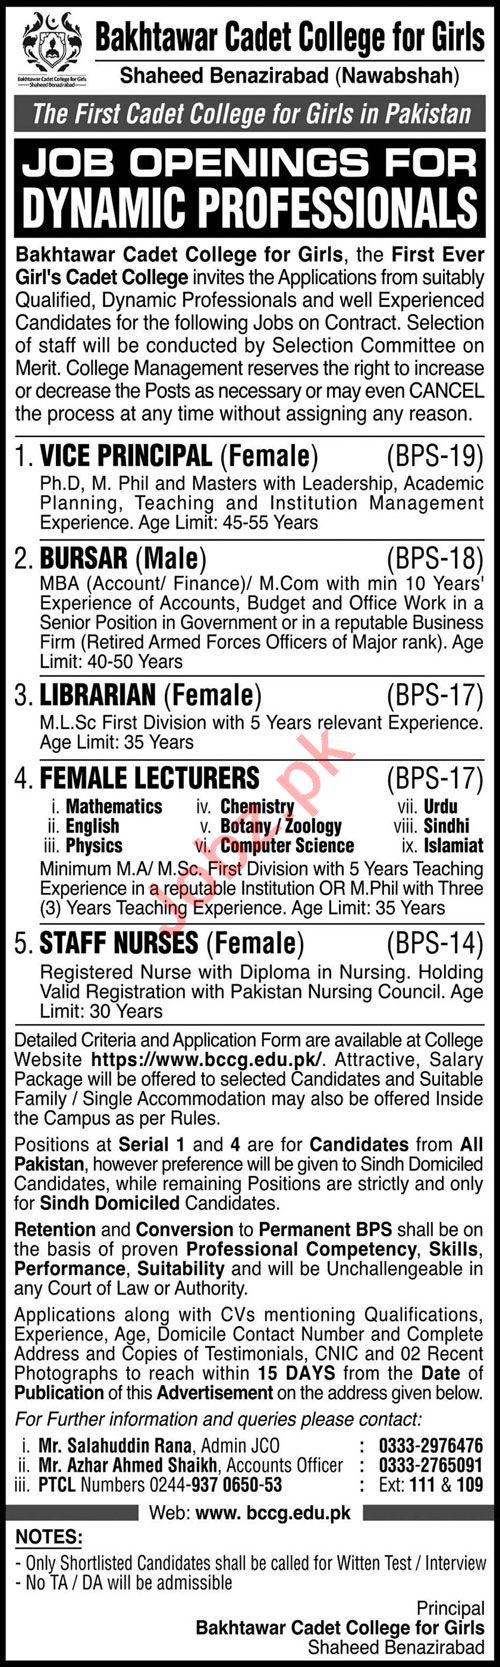 Jobs in Bakhtawar Cadet College for Girls